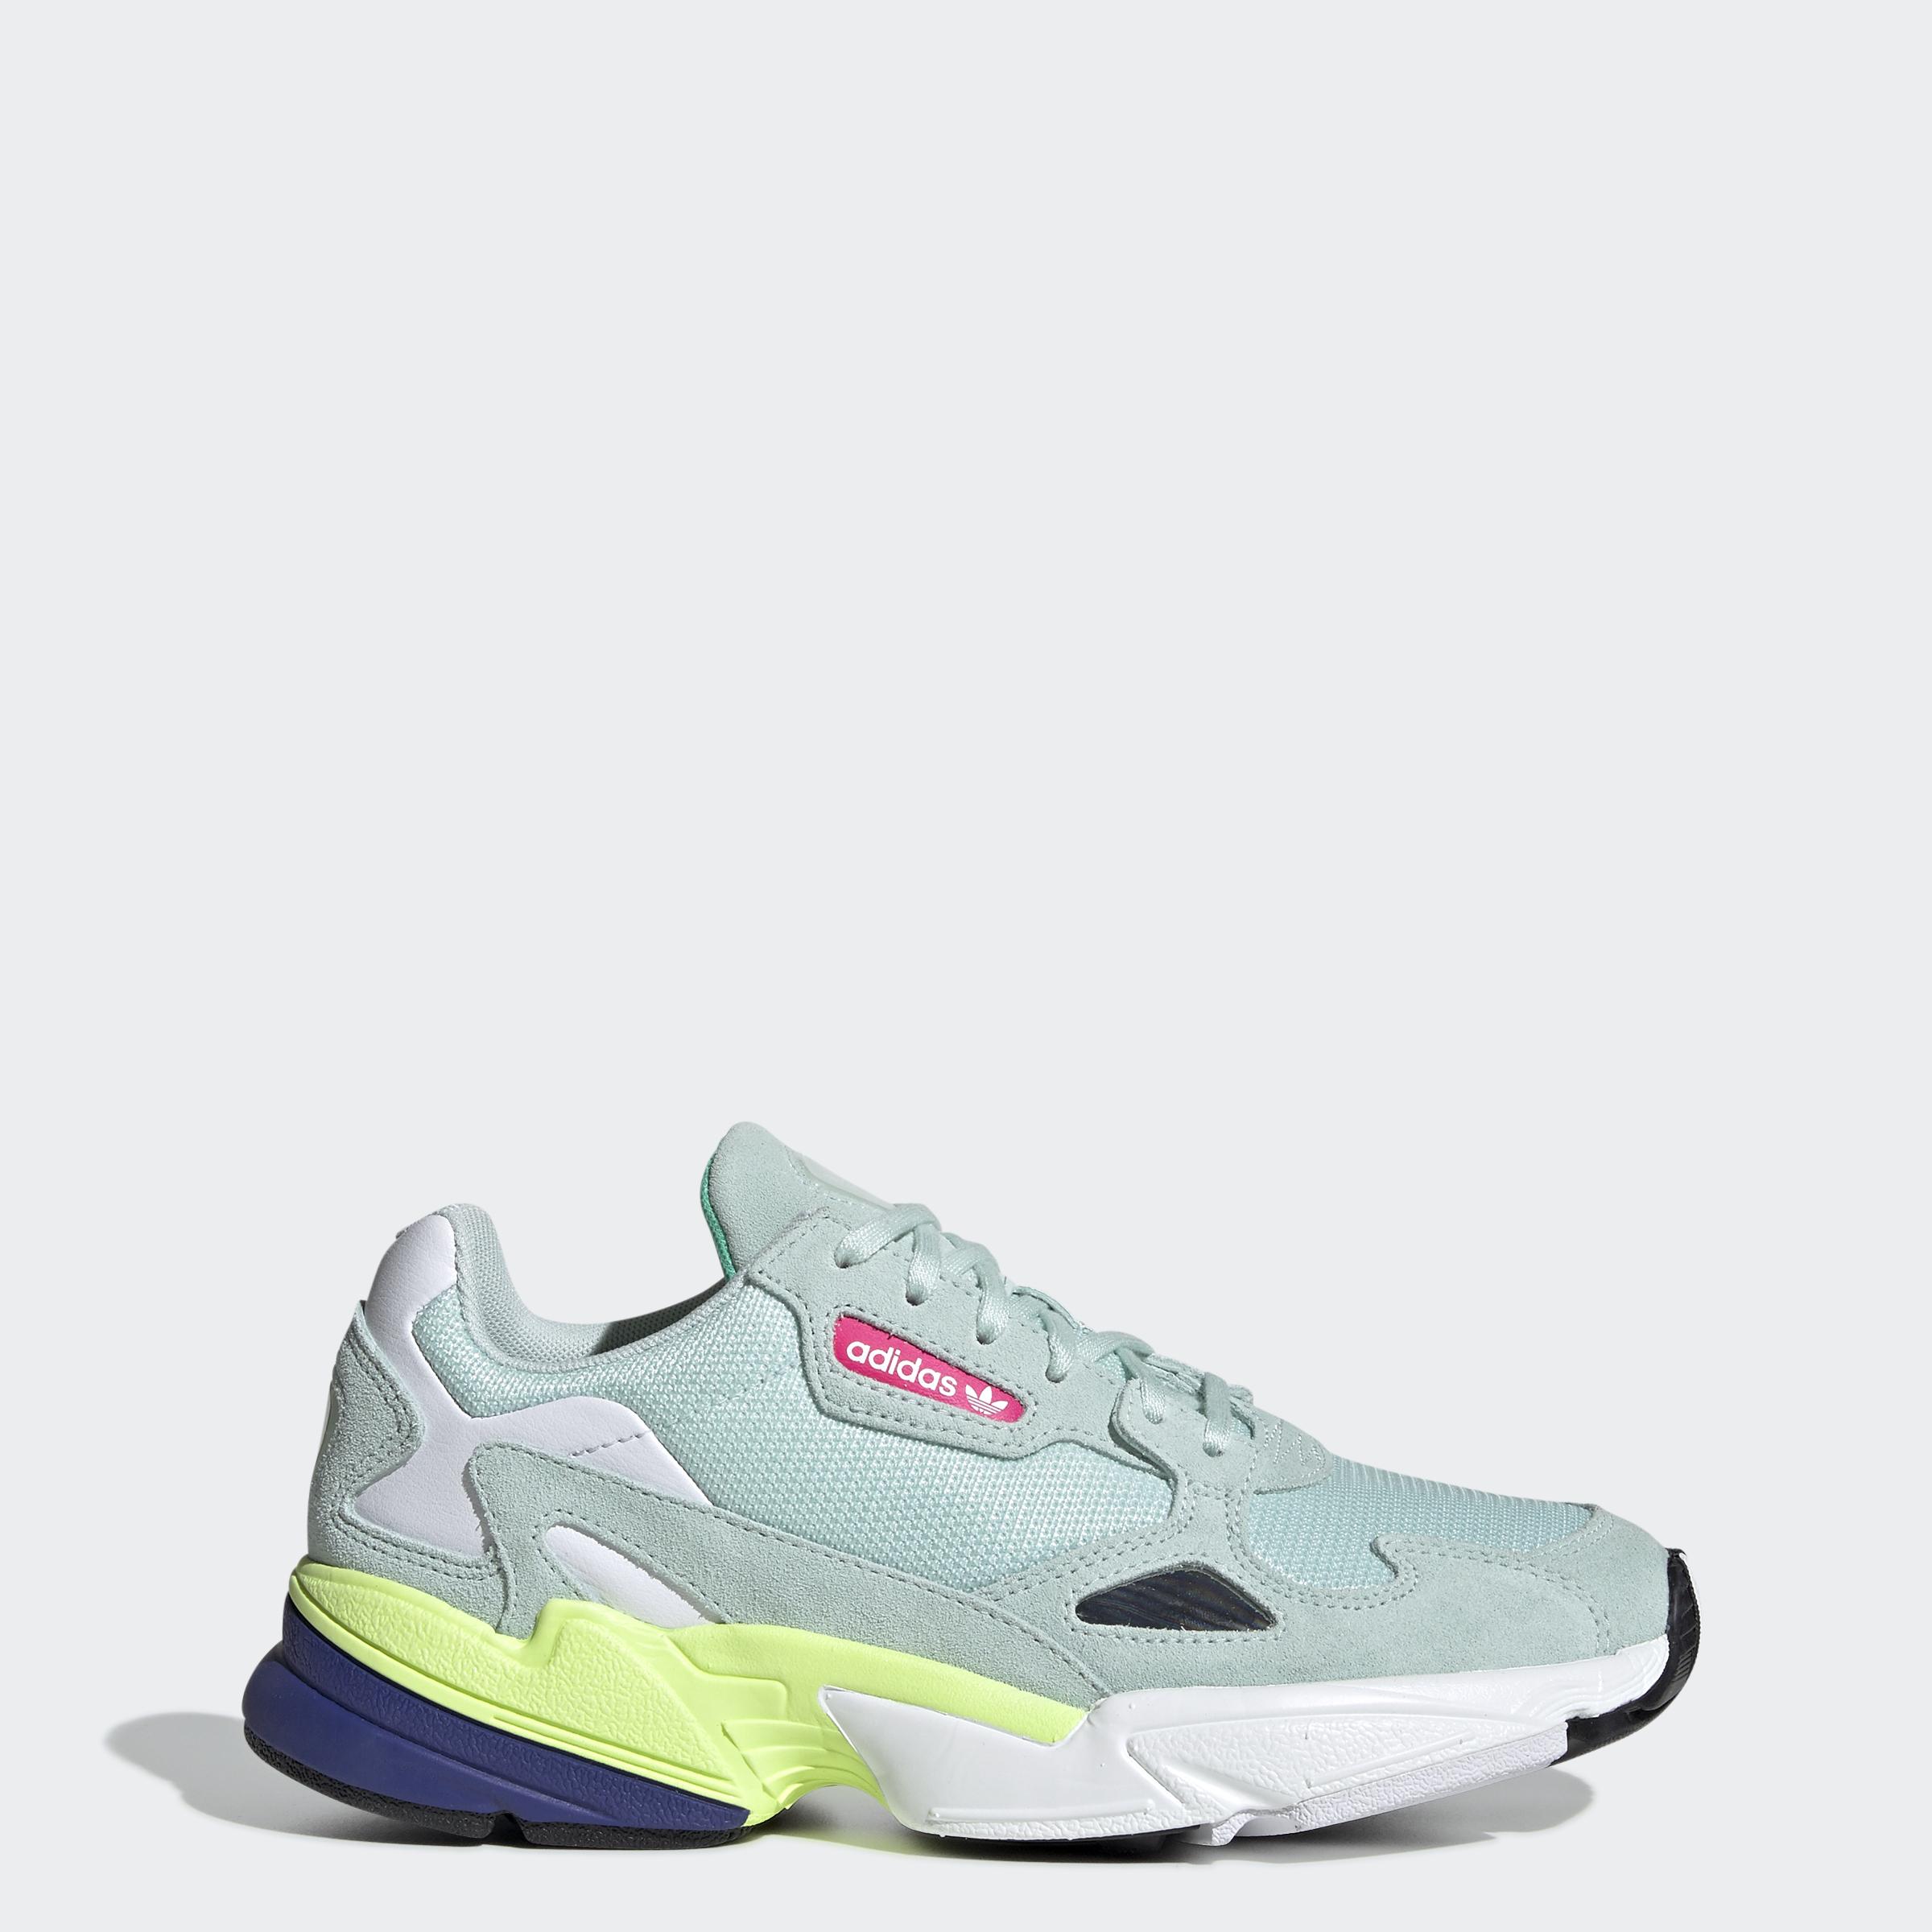 adidas-Originals-Falcon-Shoes-Women-039-s thumbnail 19